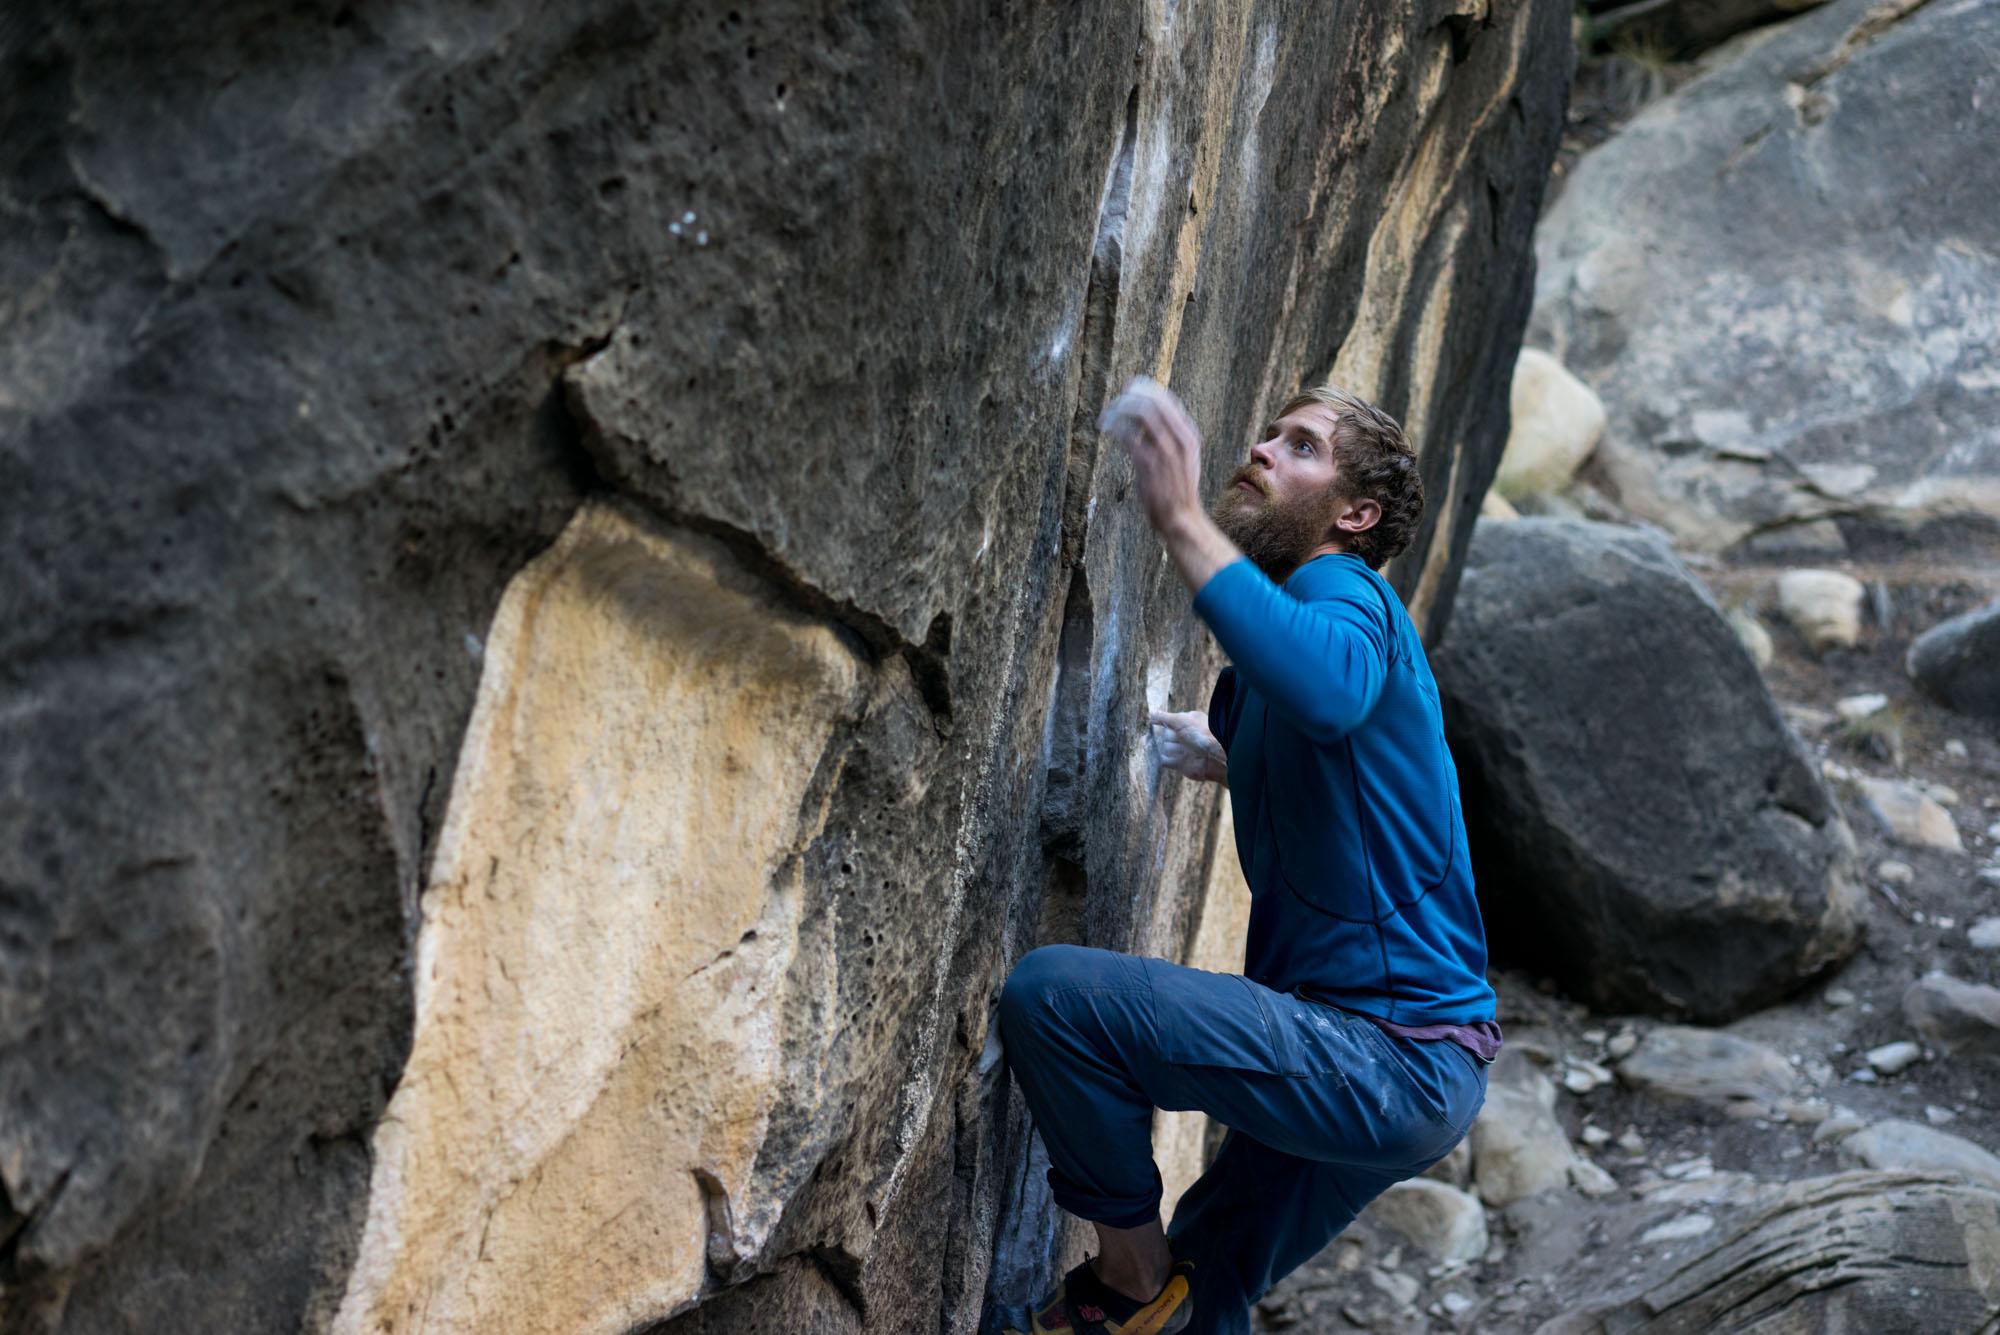 Thomas wrestling a boulder in Joe's Valley